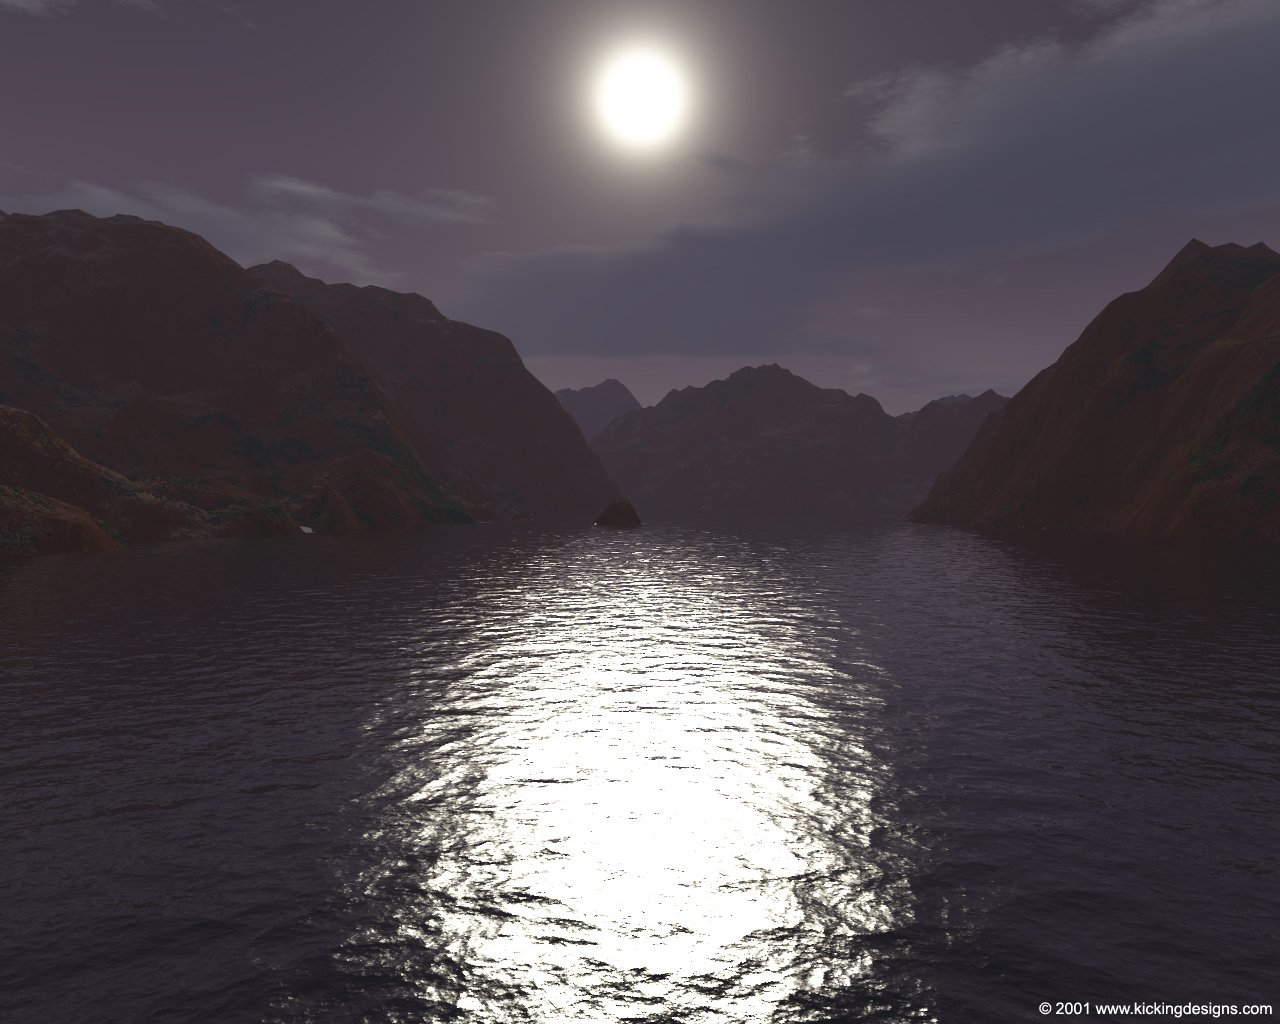 nighttime_003_1280